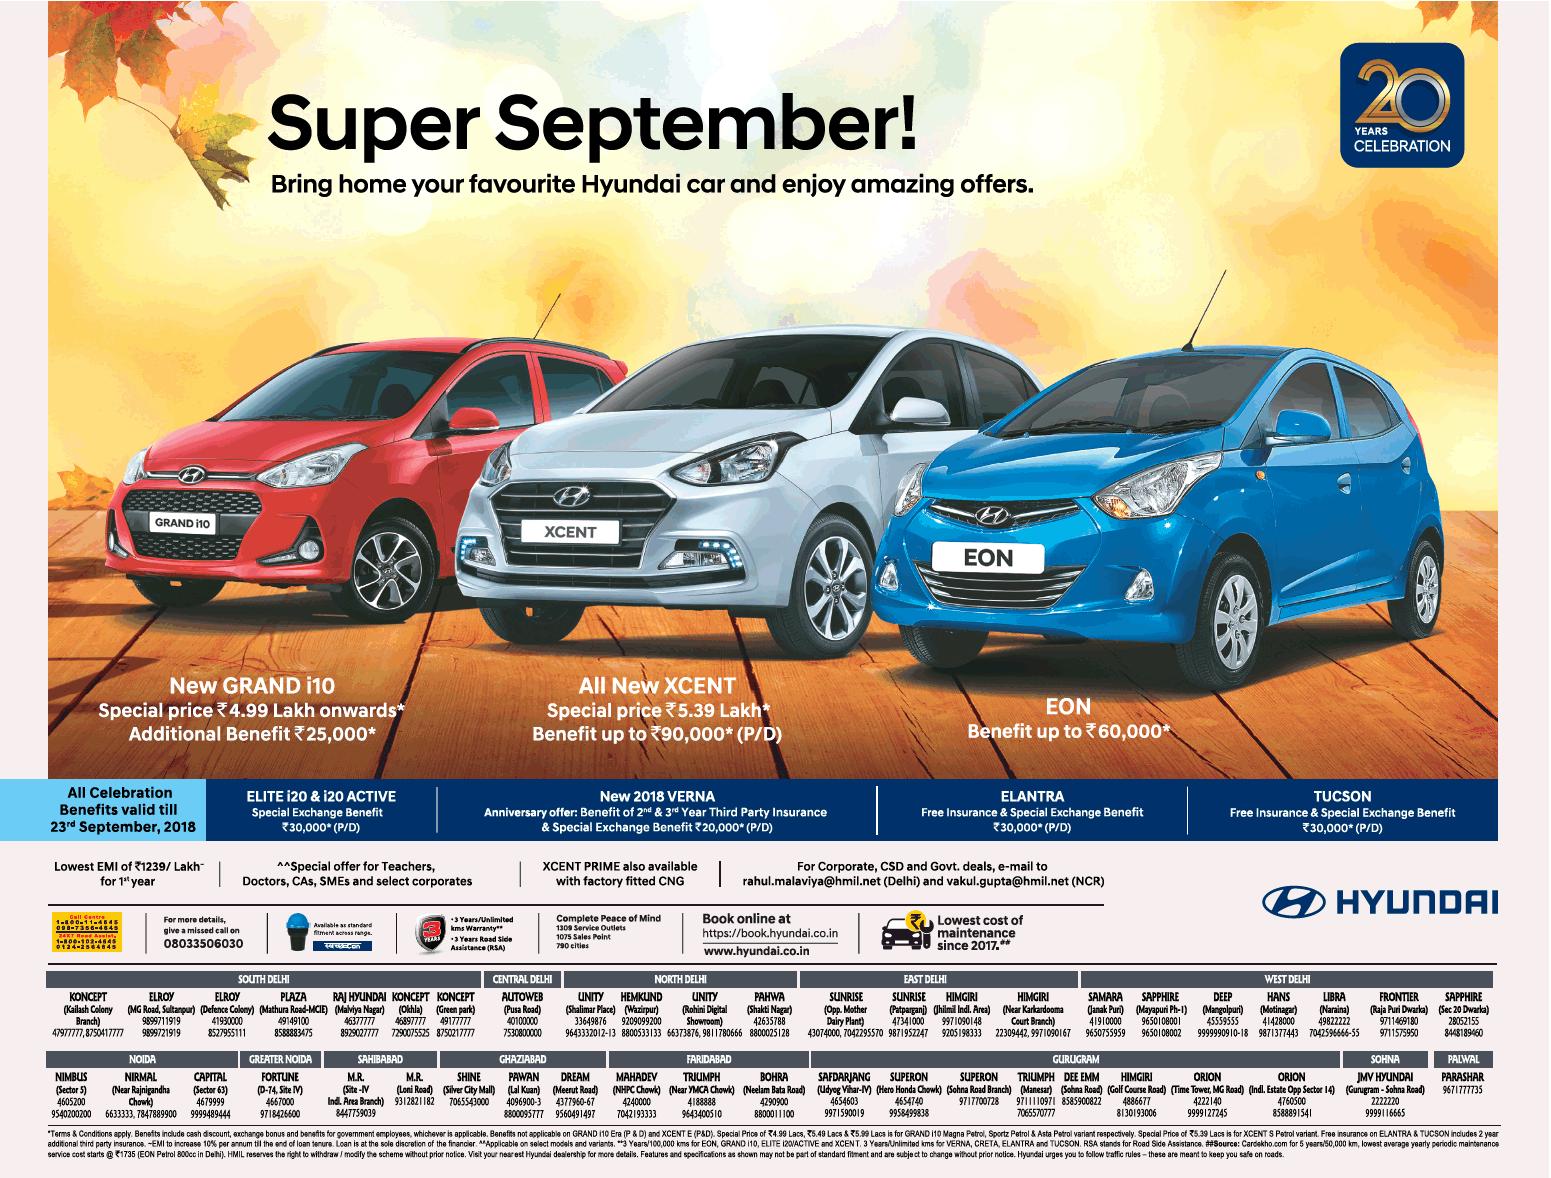 Hyundai Super September 20 Year Celebration Ad Delhi Times Check